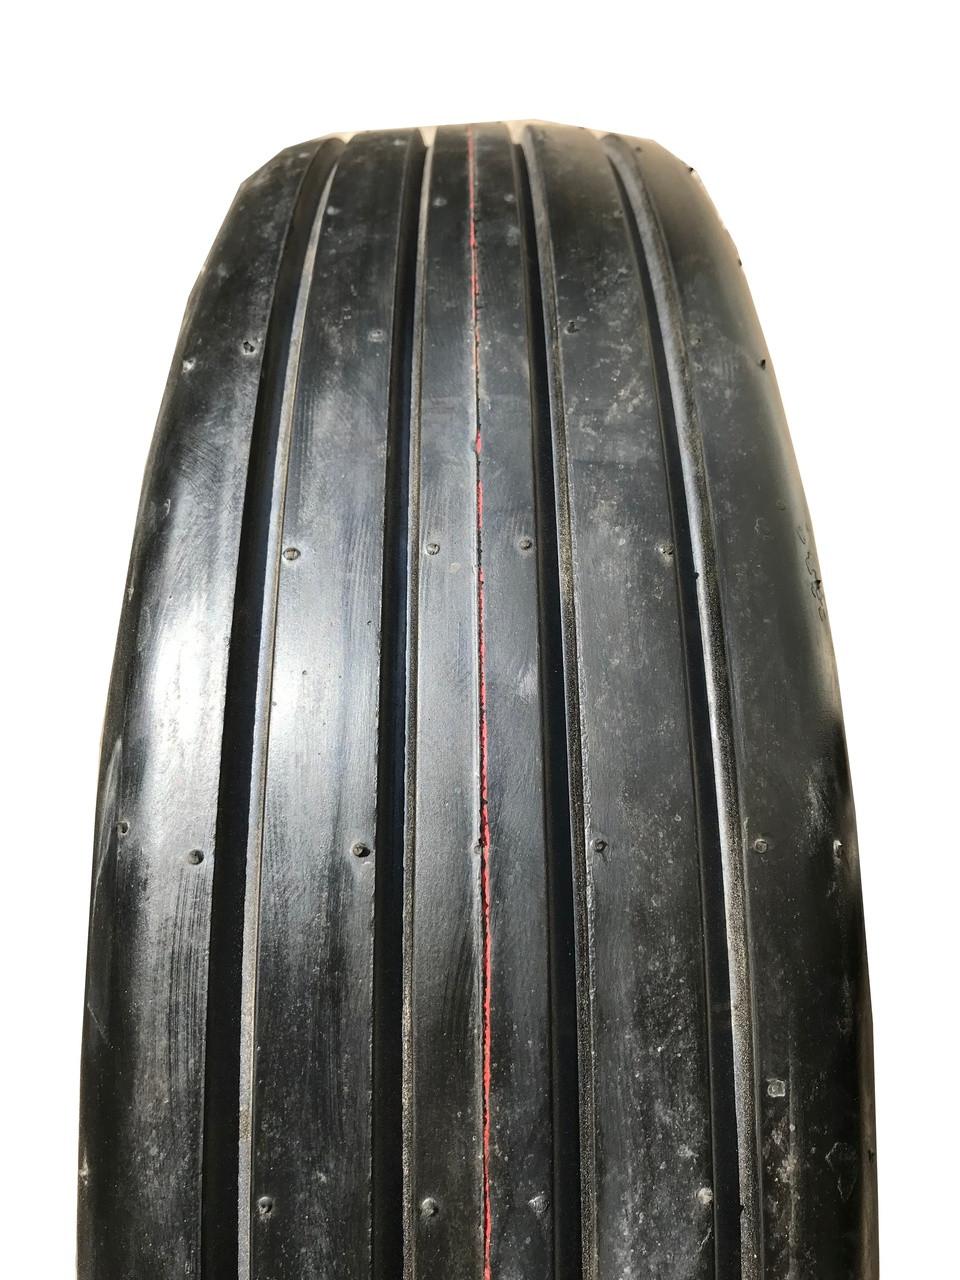 New Tire 6.70 15 Harvest King Rib Implement 6 Ply TT 6.70x15